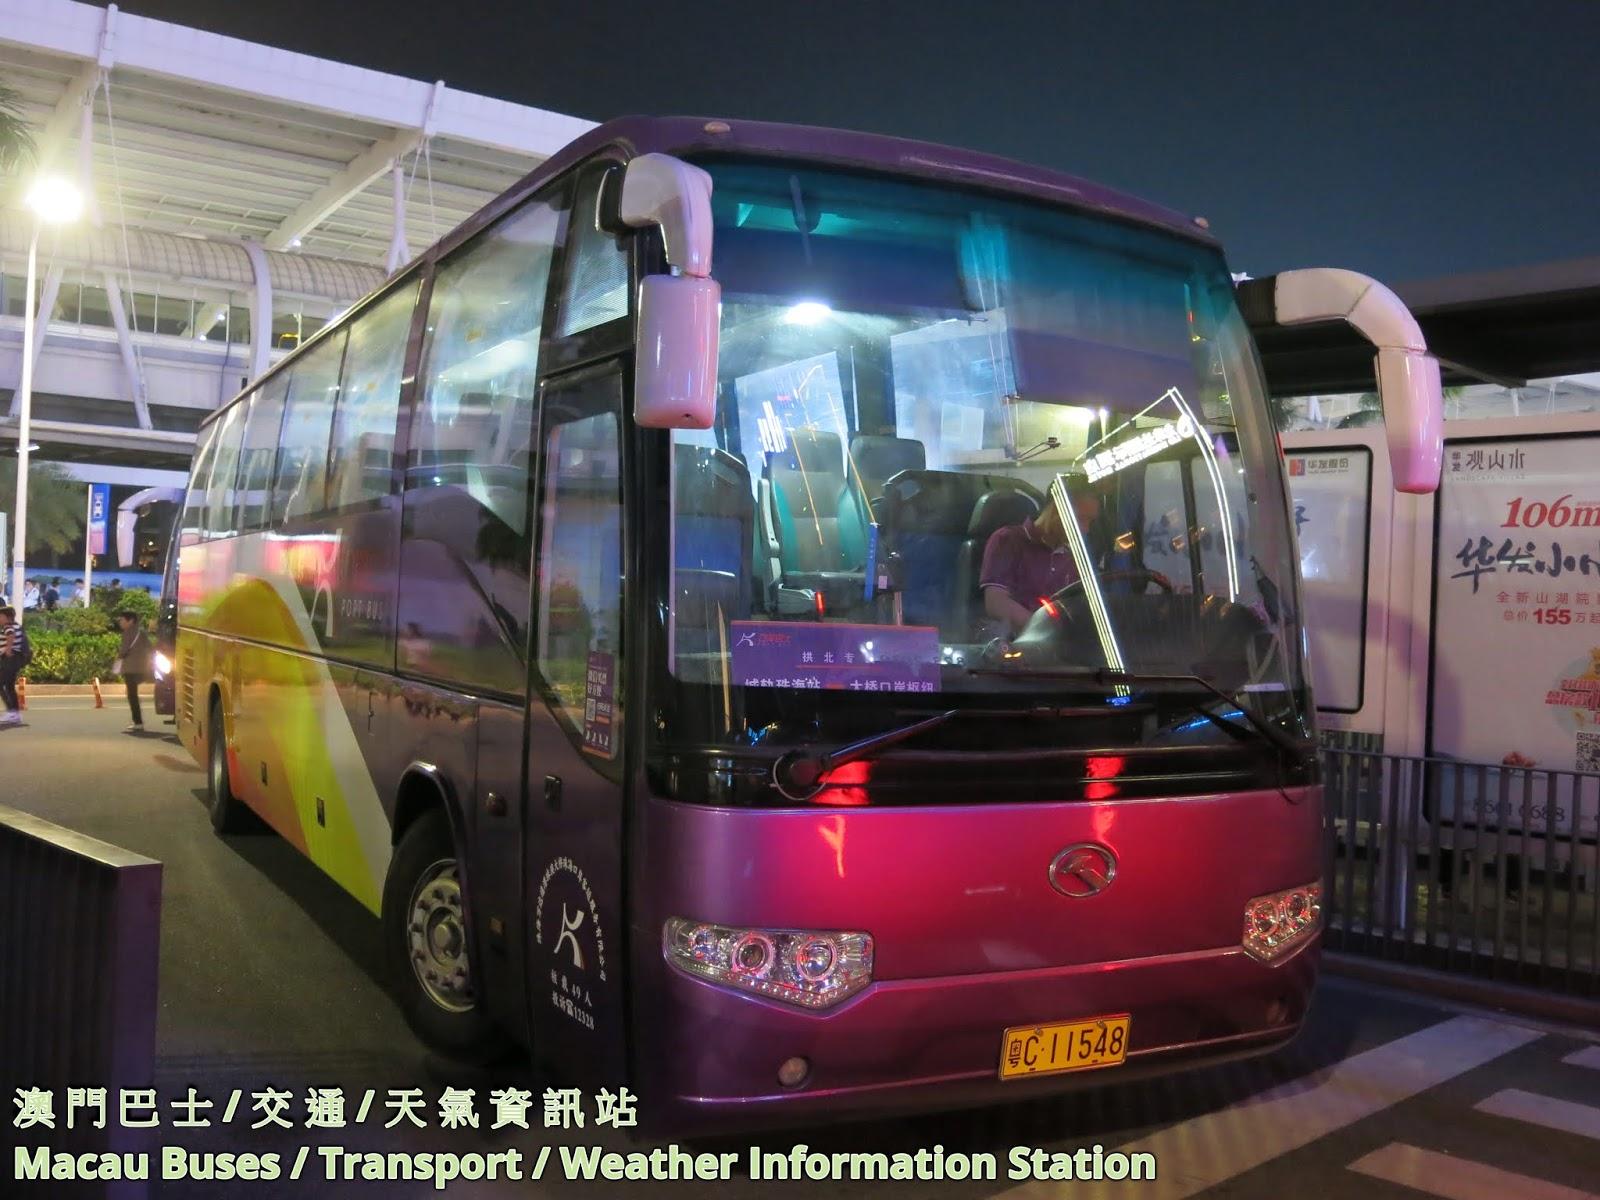 澳 門 巴 士 / 交 通 / 天 氣 資 訊 站 Macau Buses / Transport / Weather Information Station: 珠海萬通達港珠澳大橋口岸巴士 ...